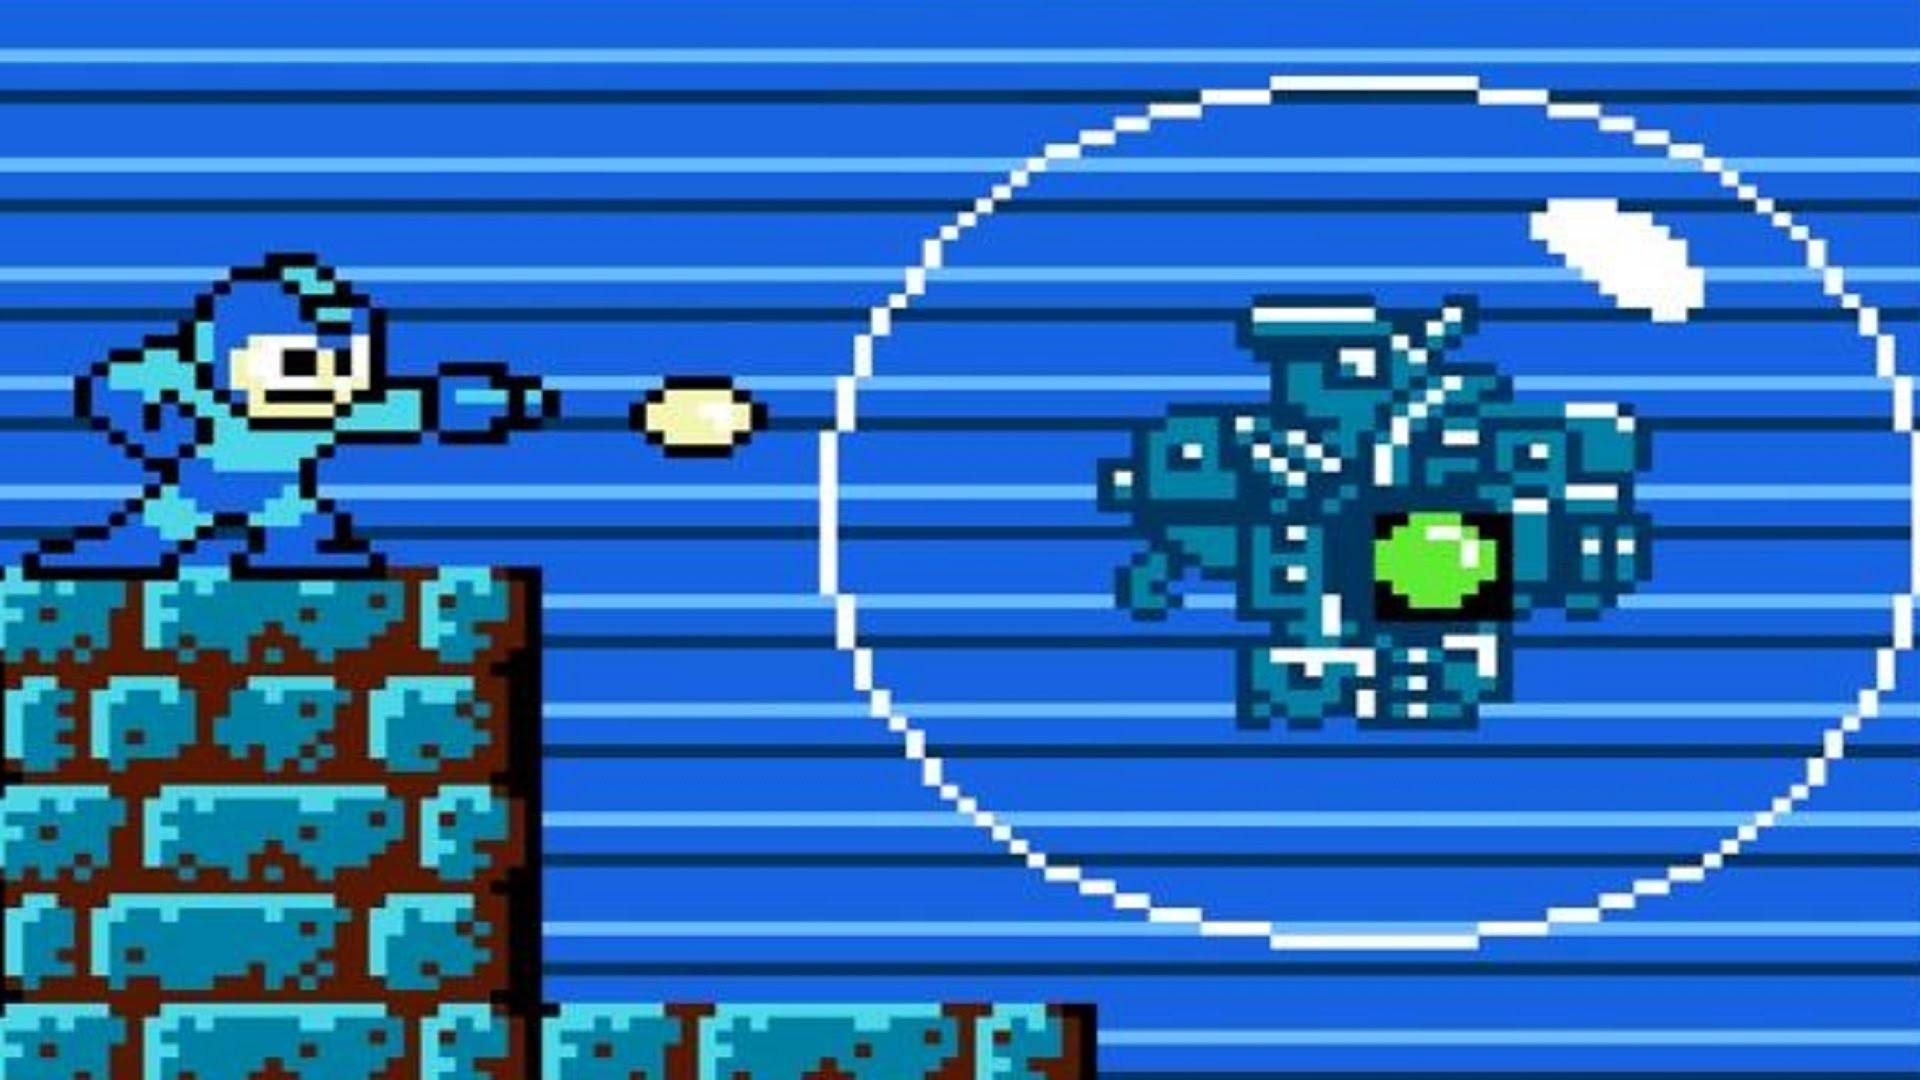 Mega Man: CWU-01P (Bubble Robots) Boss Fight (1080p 60fps)